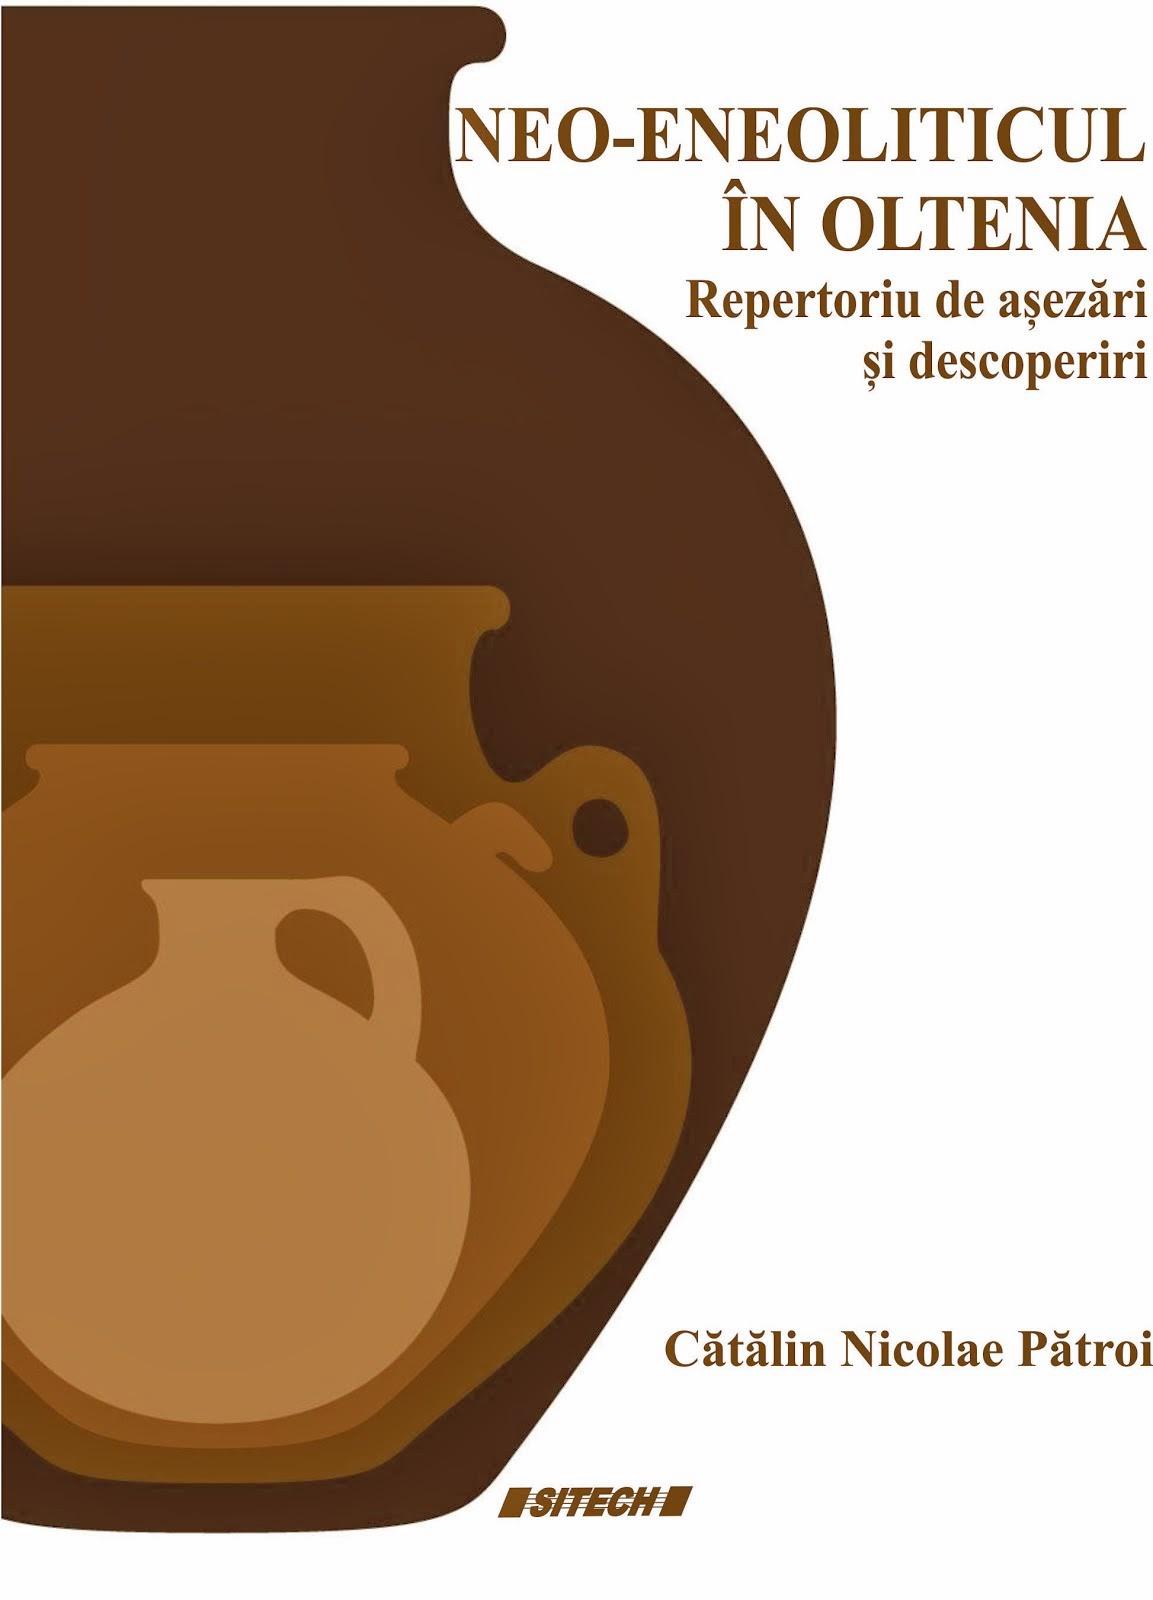 Neo-Eneoliticul in Oltenia. Repertoriu de asezari si descoperiri. Publicat in anul 2013.